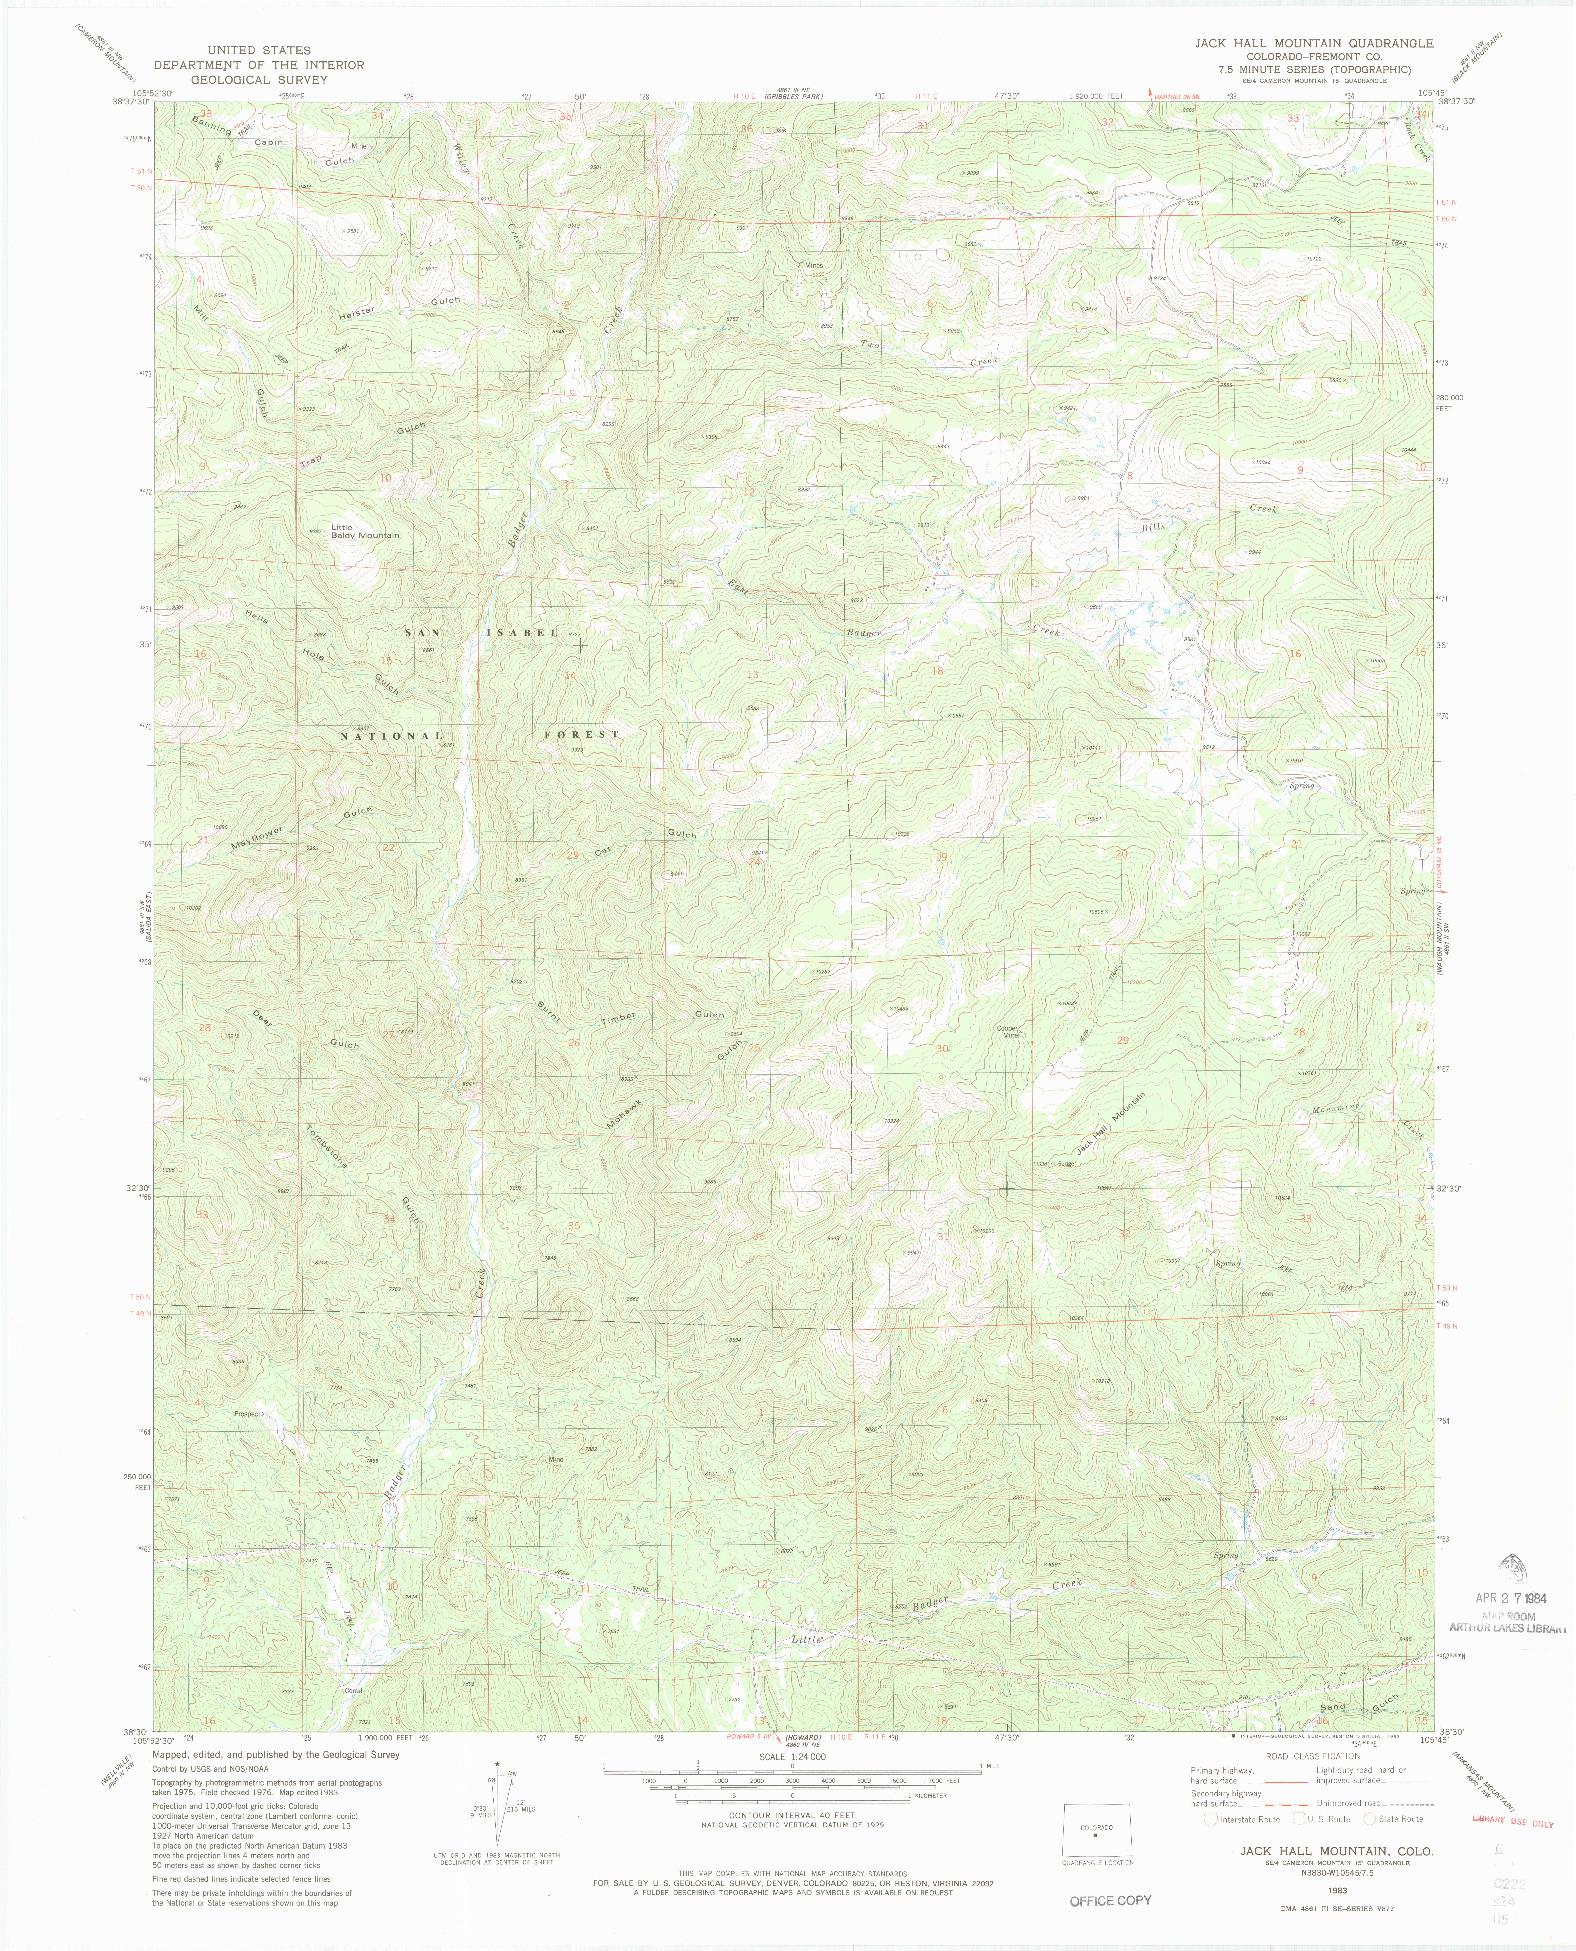 USGS 1:24000-SCALE QUADRANGLE FOR JACK HALL MOUNTAIN, CO 1983